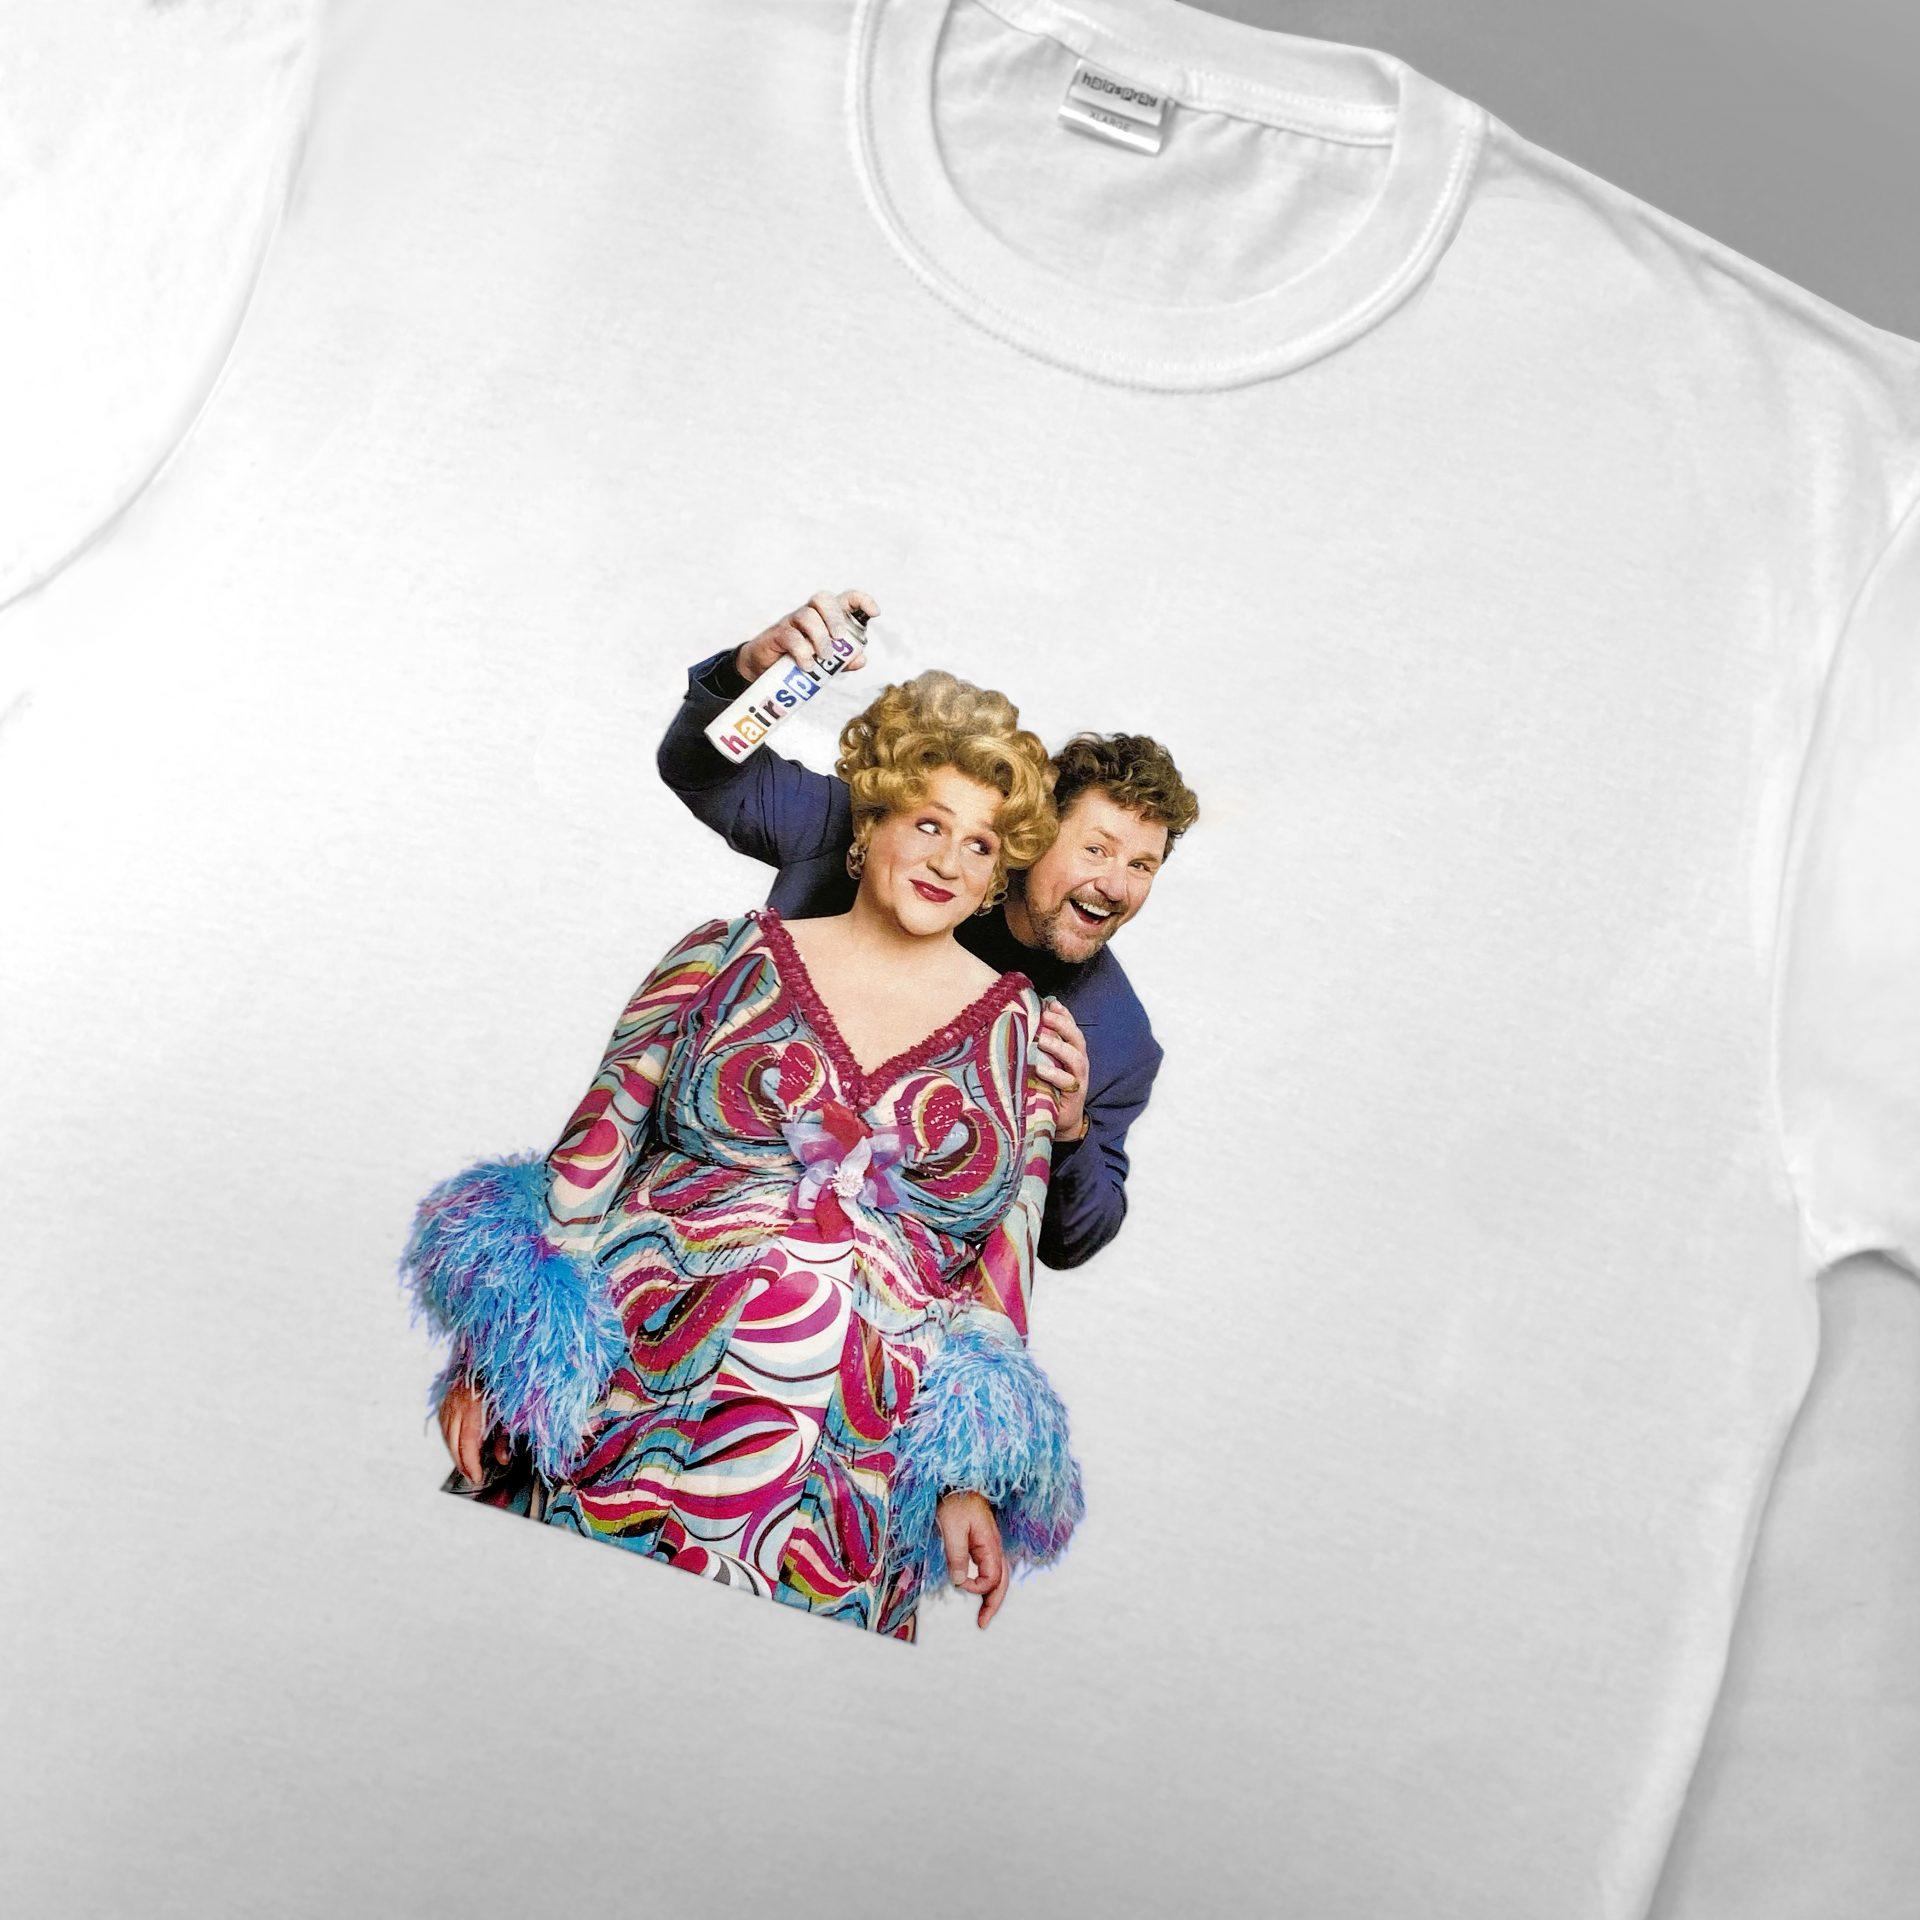 Hairspray DTG printed Gildan T-shirt